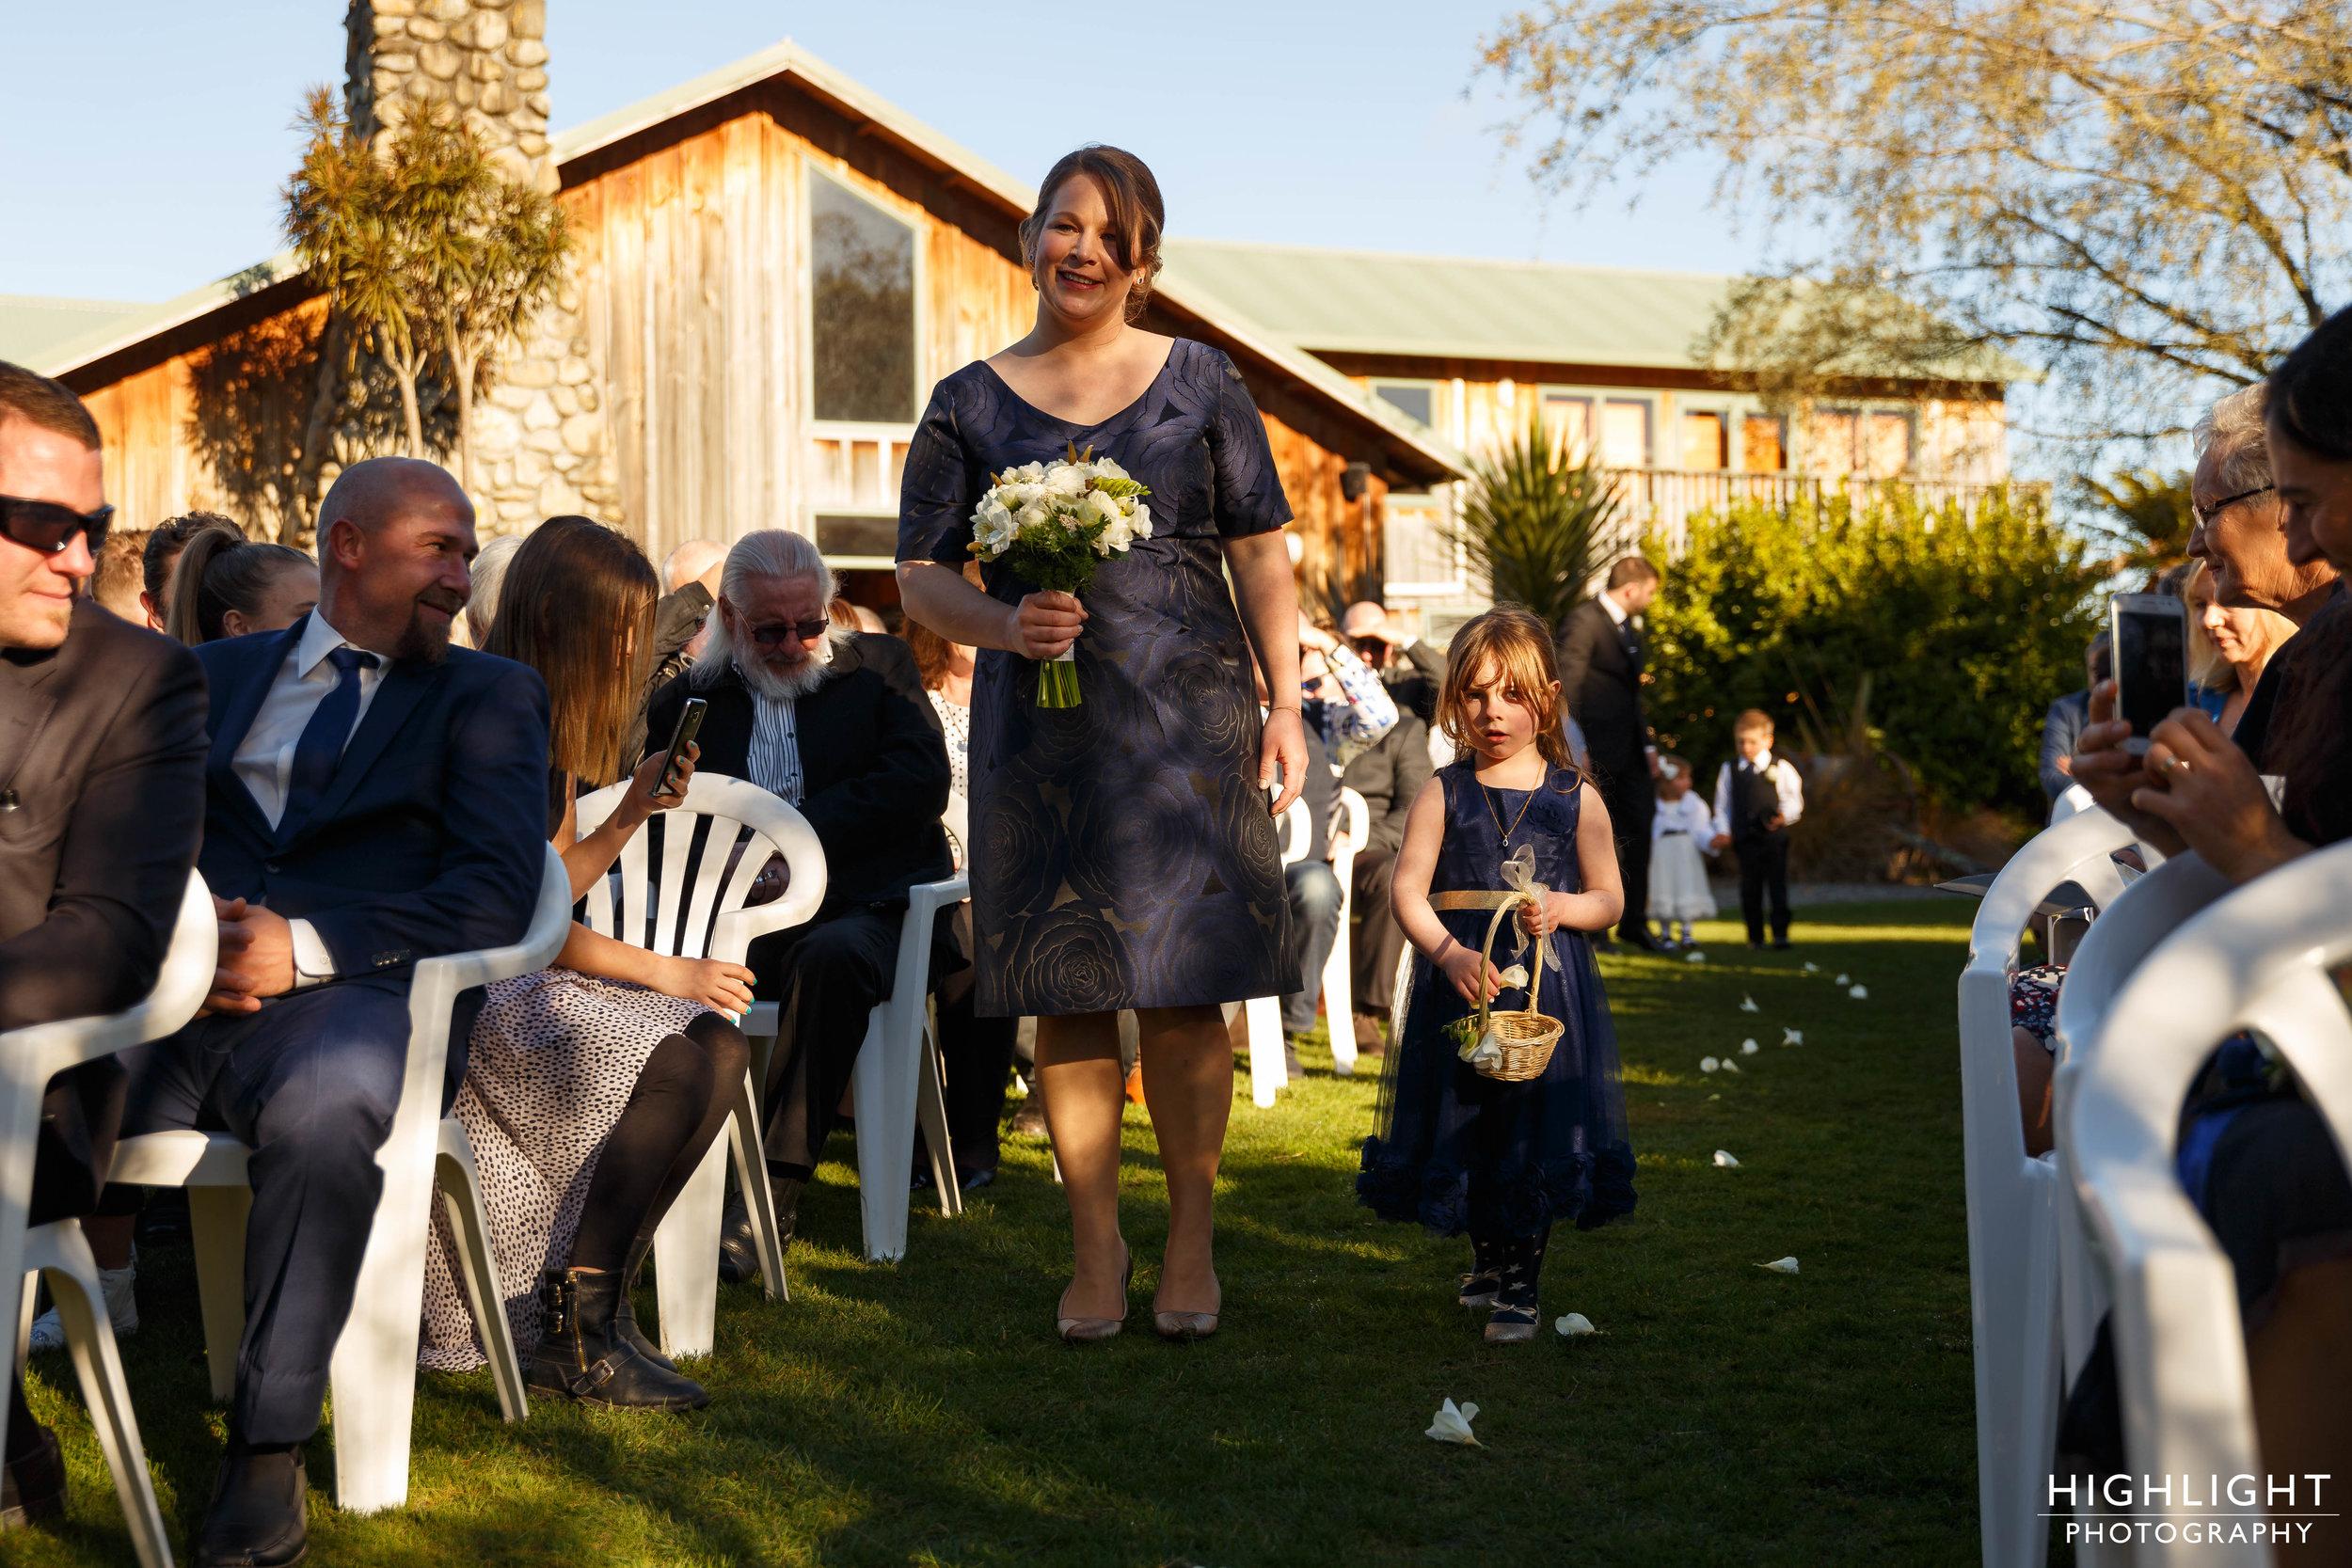 makoura-wedding-photography-highlight-new-zealand-25.jpg